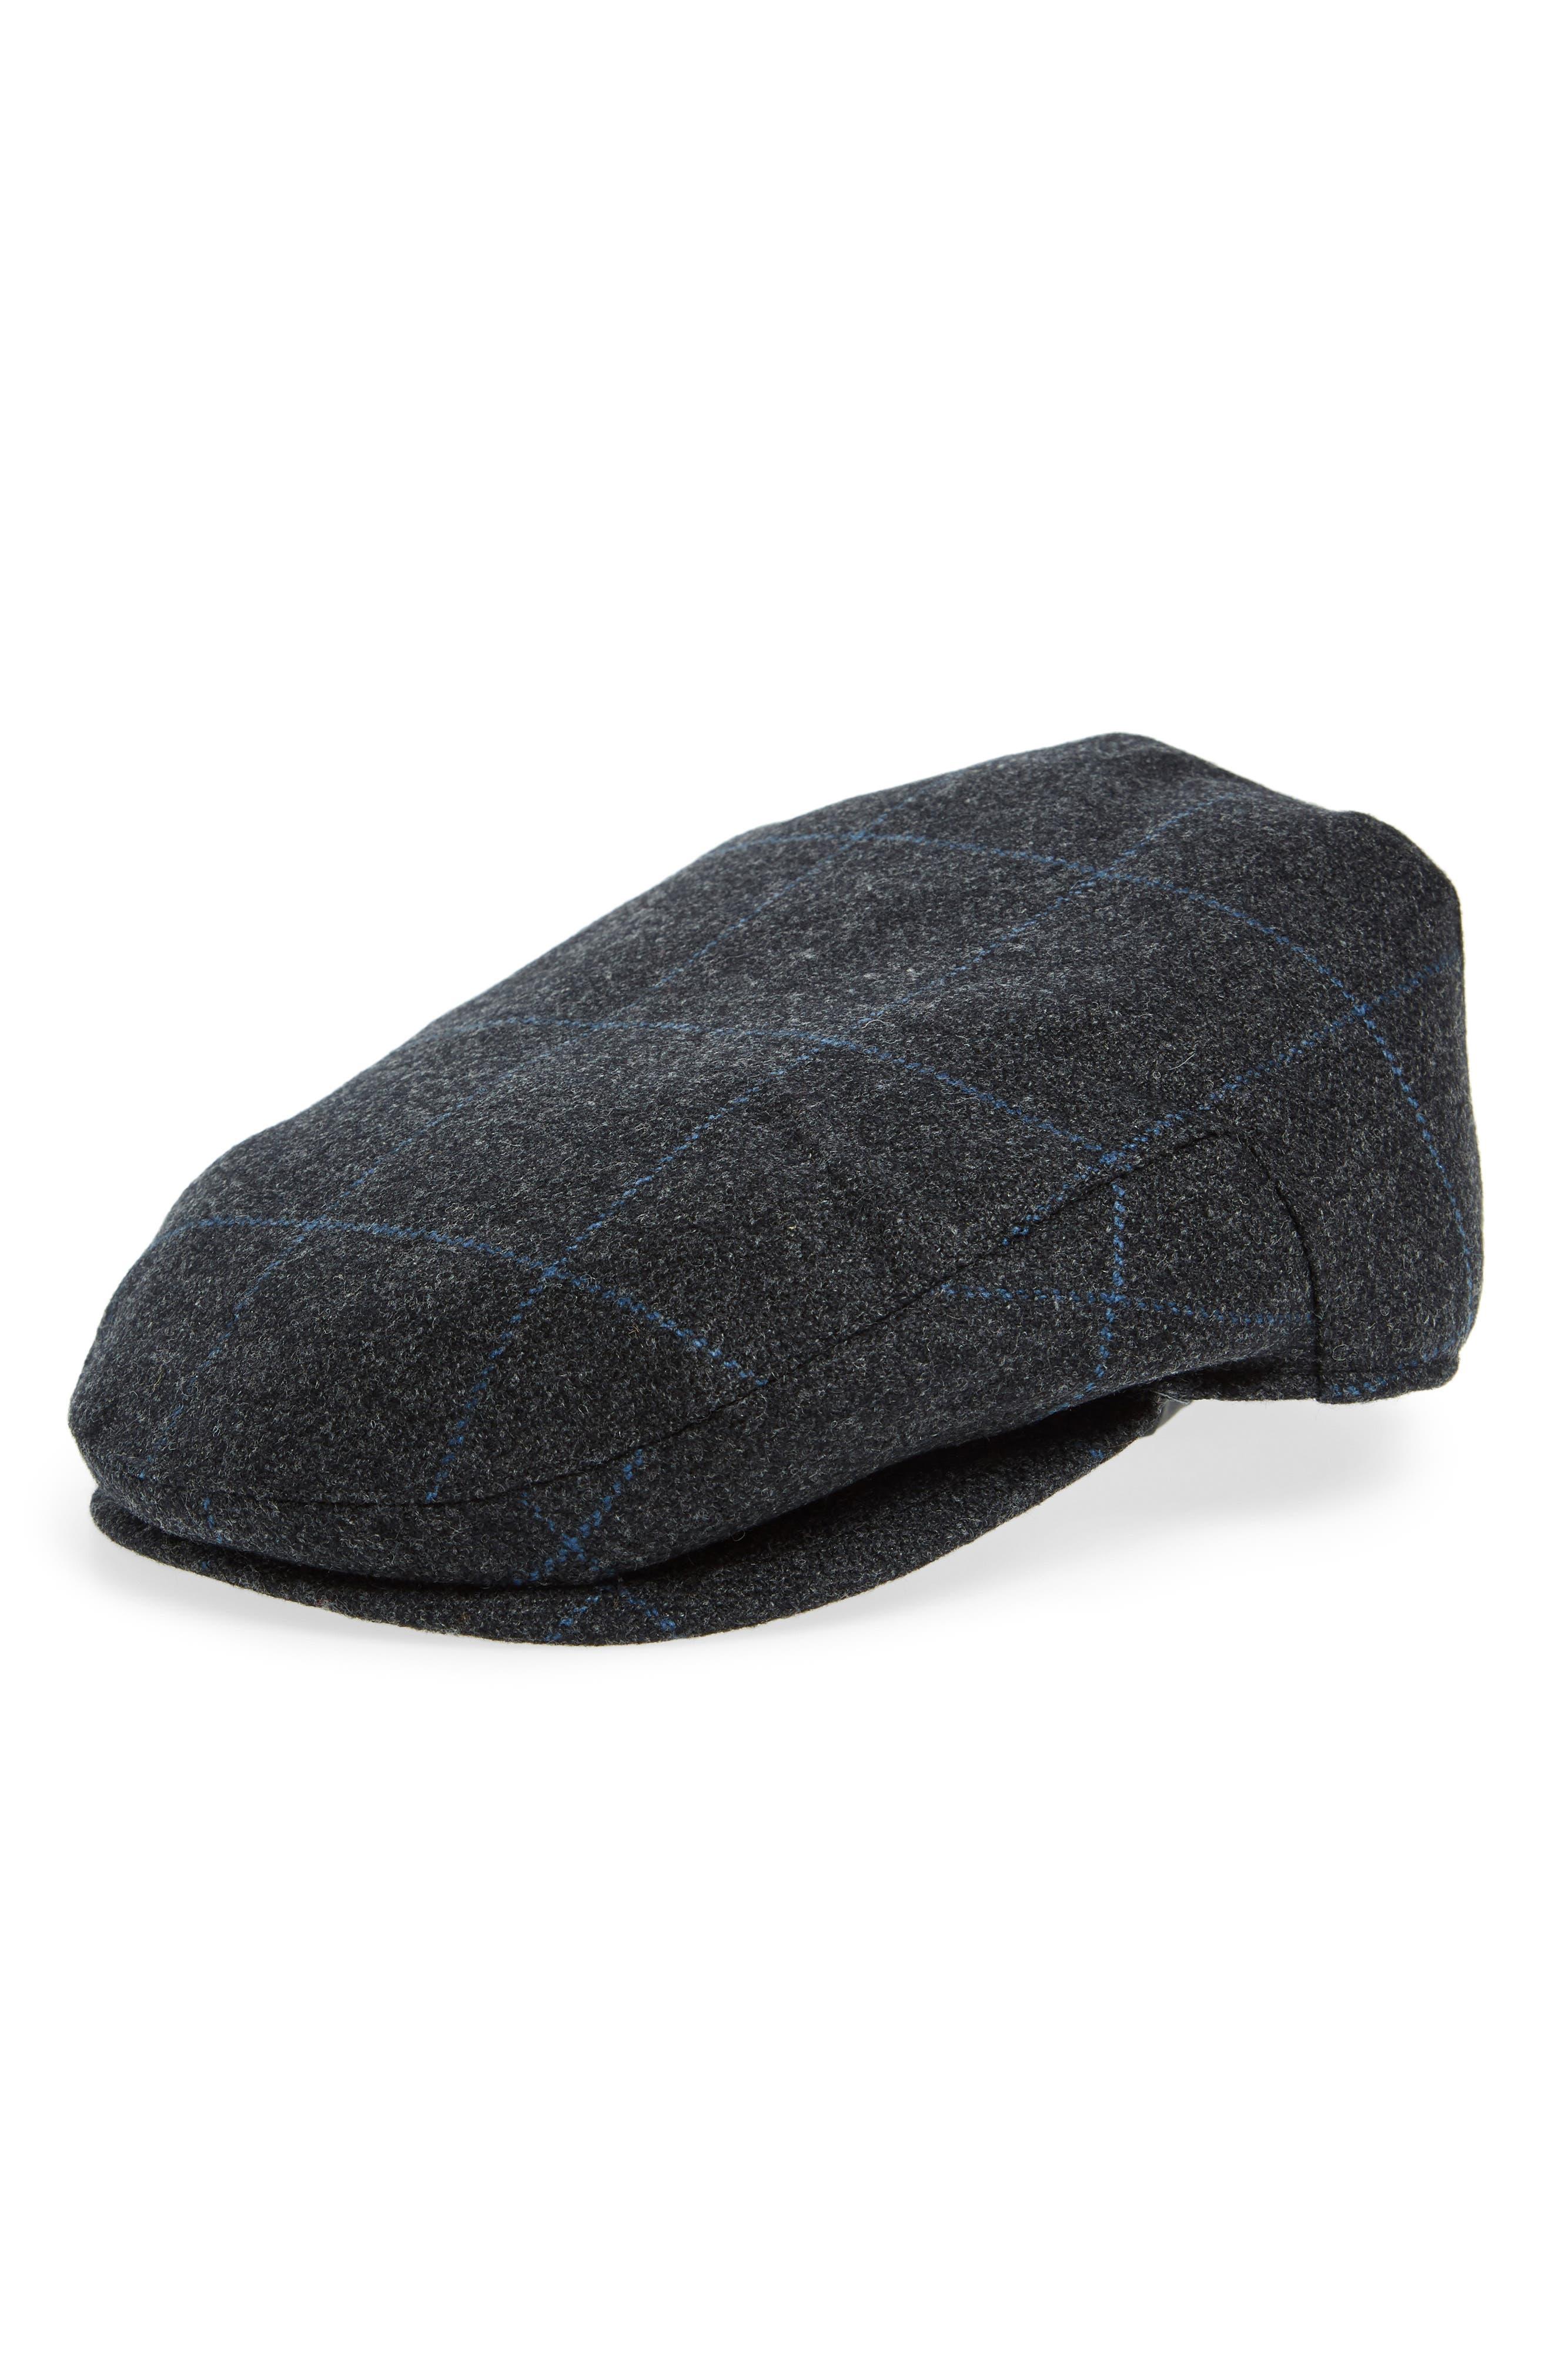 Christy's Brighton Wool Driving Cap